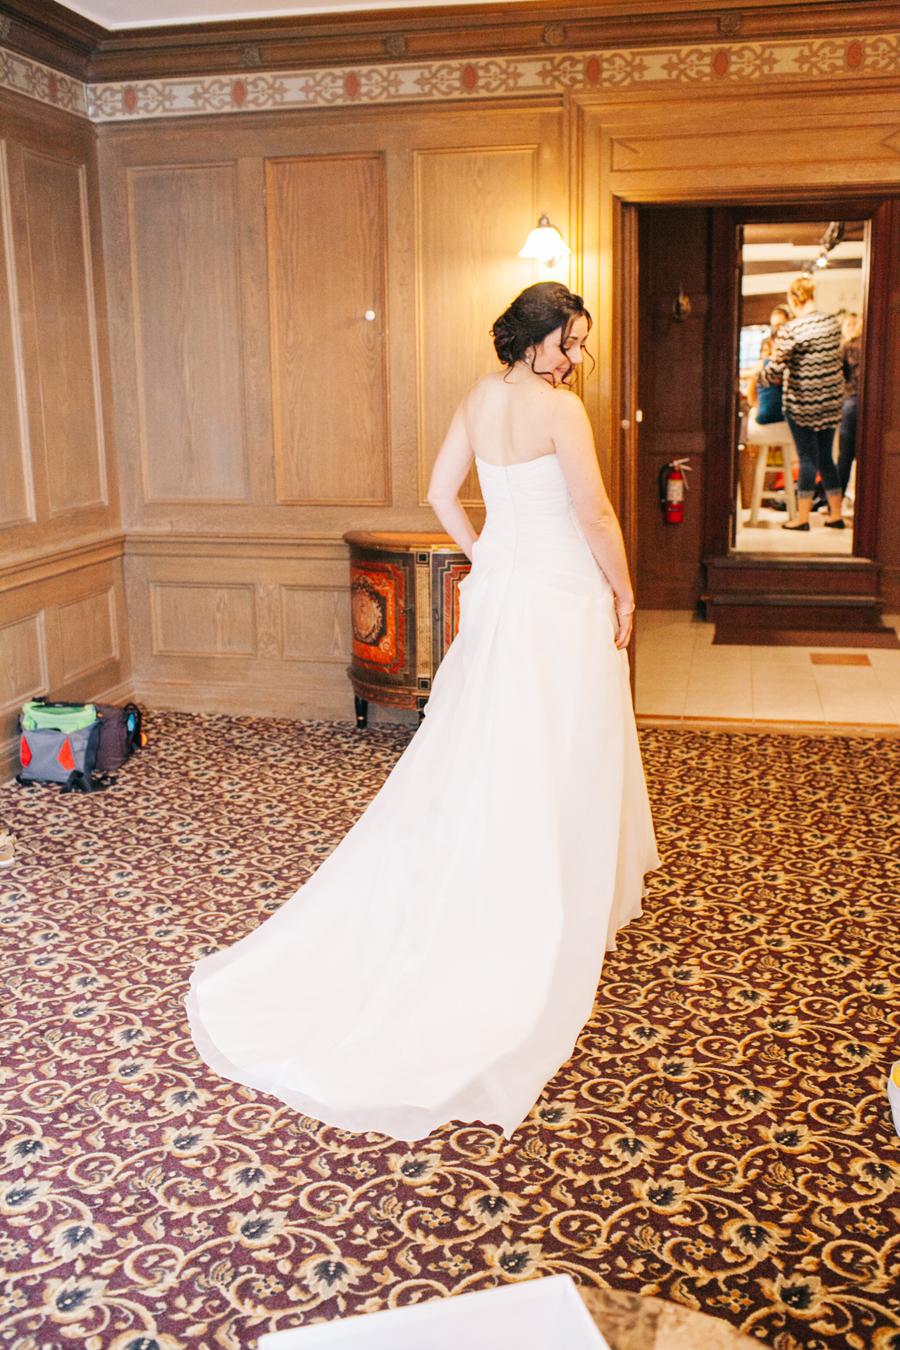 010-lairmont-manor-bellingham-washington-wedding-katheryn-moran-photography.jpg